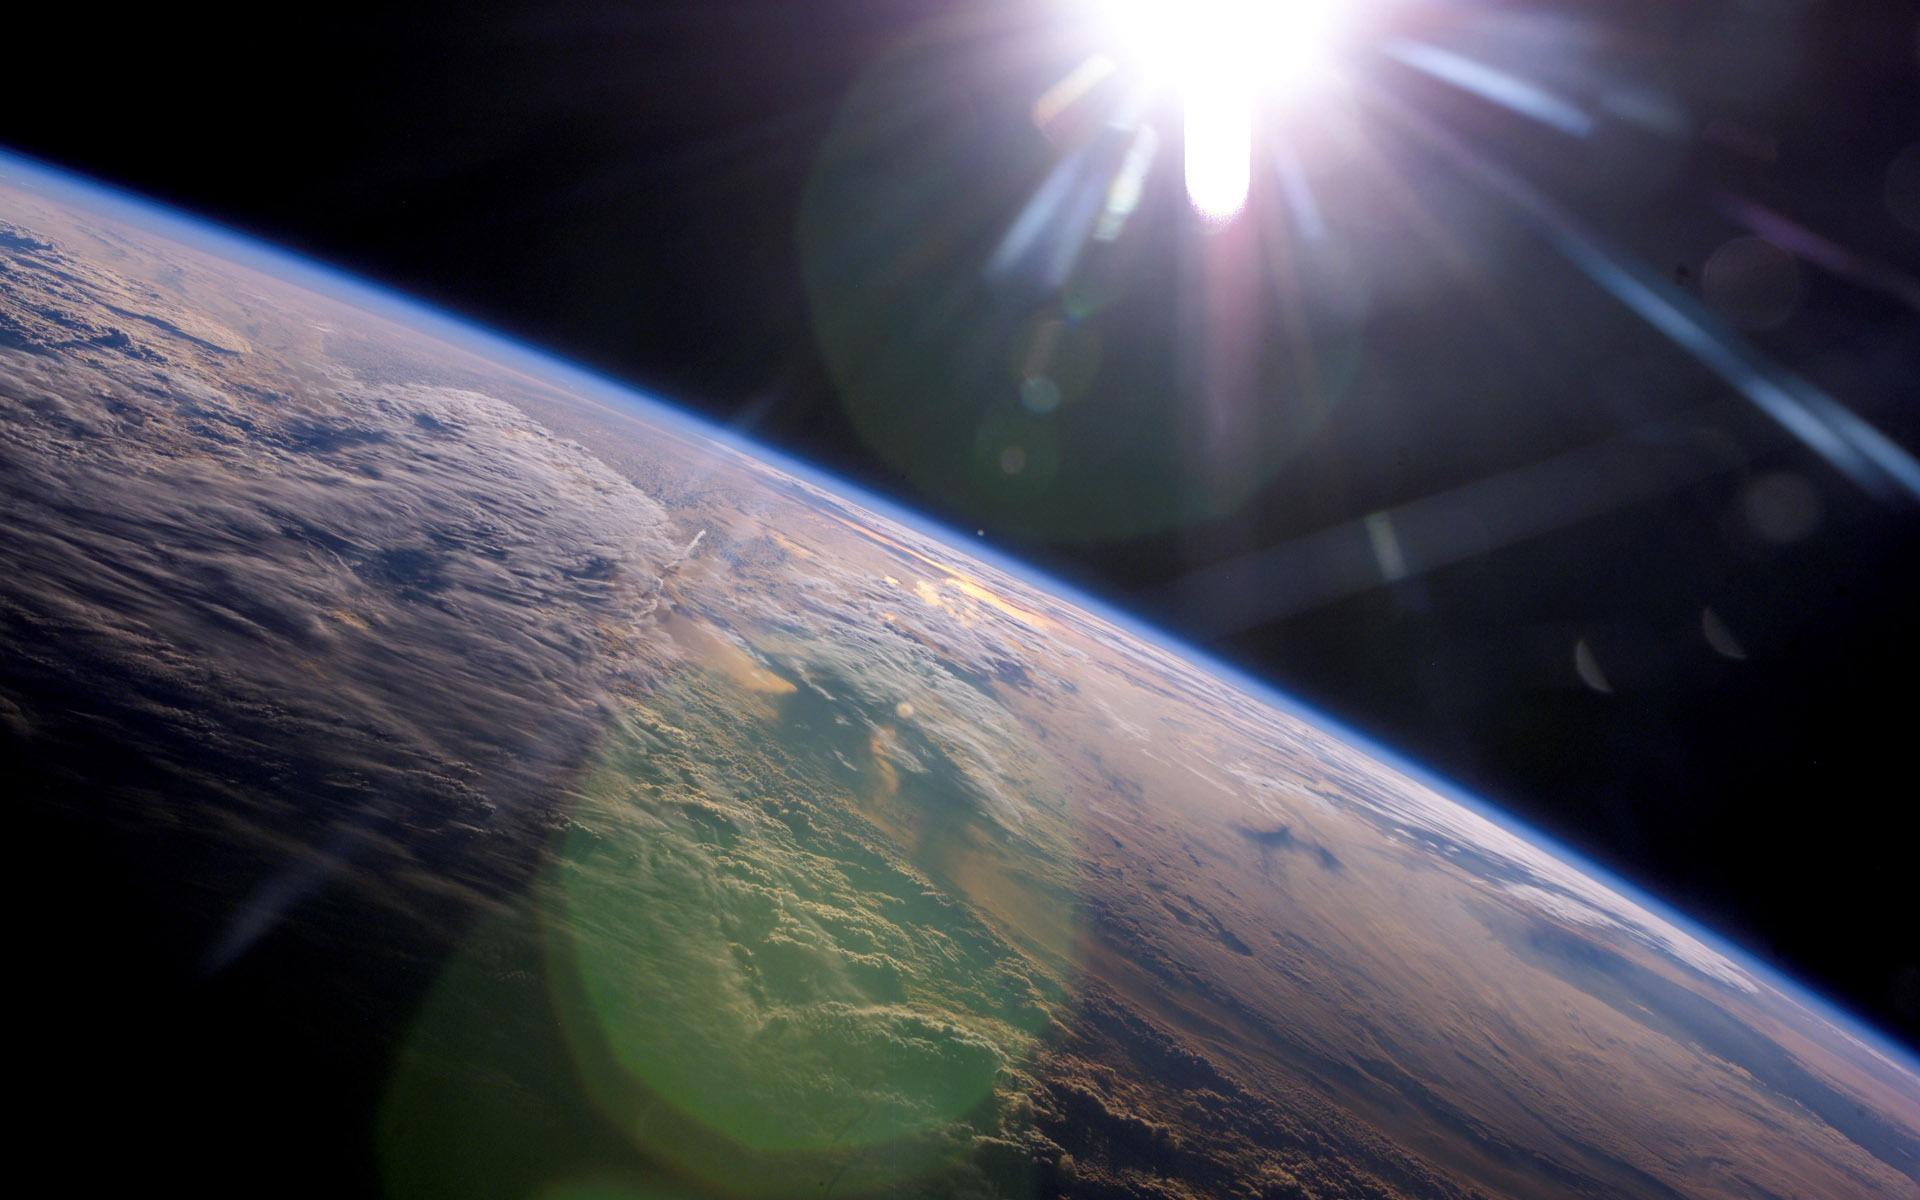 Fondos De Pantalla Alta Definicion: Fondos De Pantalla De Alta Definición Espacial De La NASA